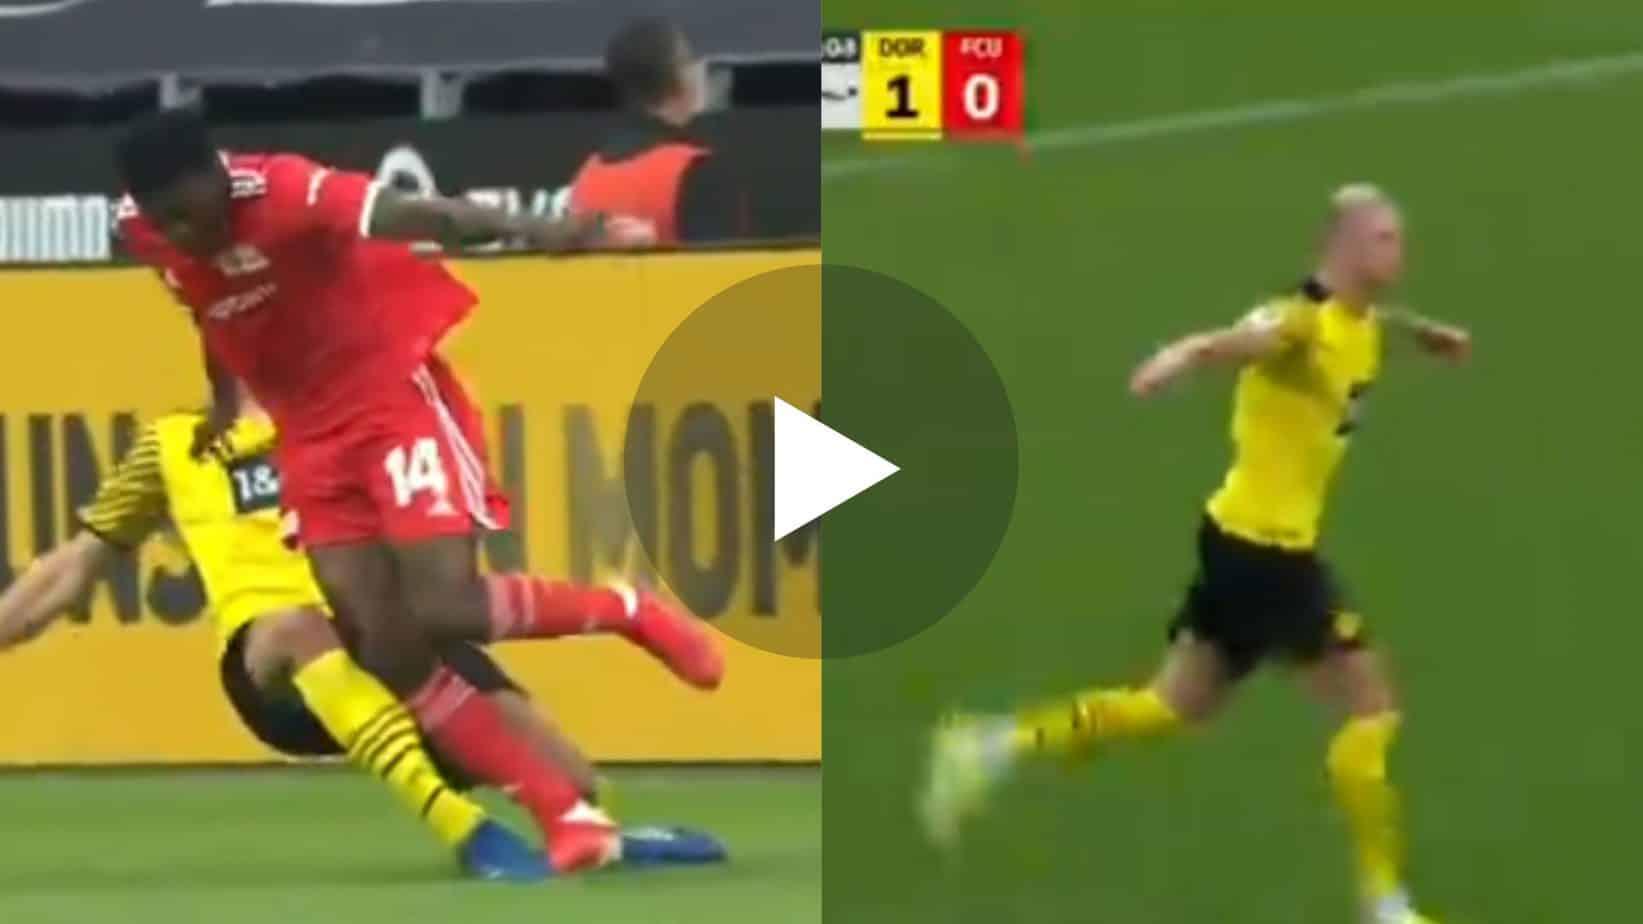 Video: GOOOAL Man Utd target Erling Haaland scores 12th goal in last 10 games